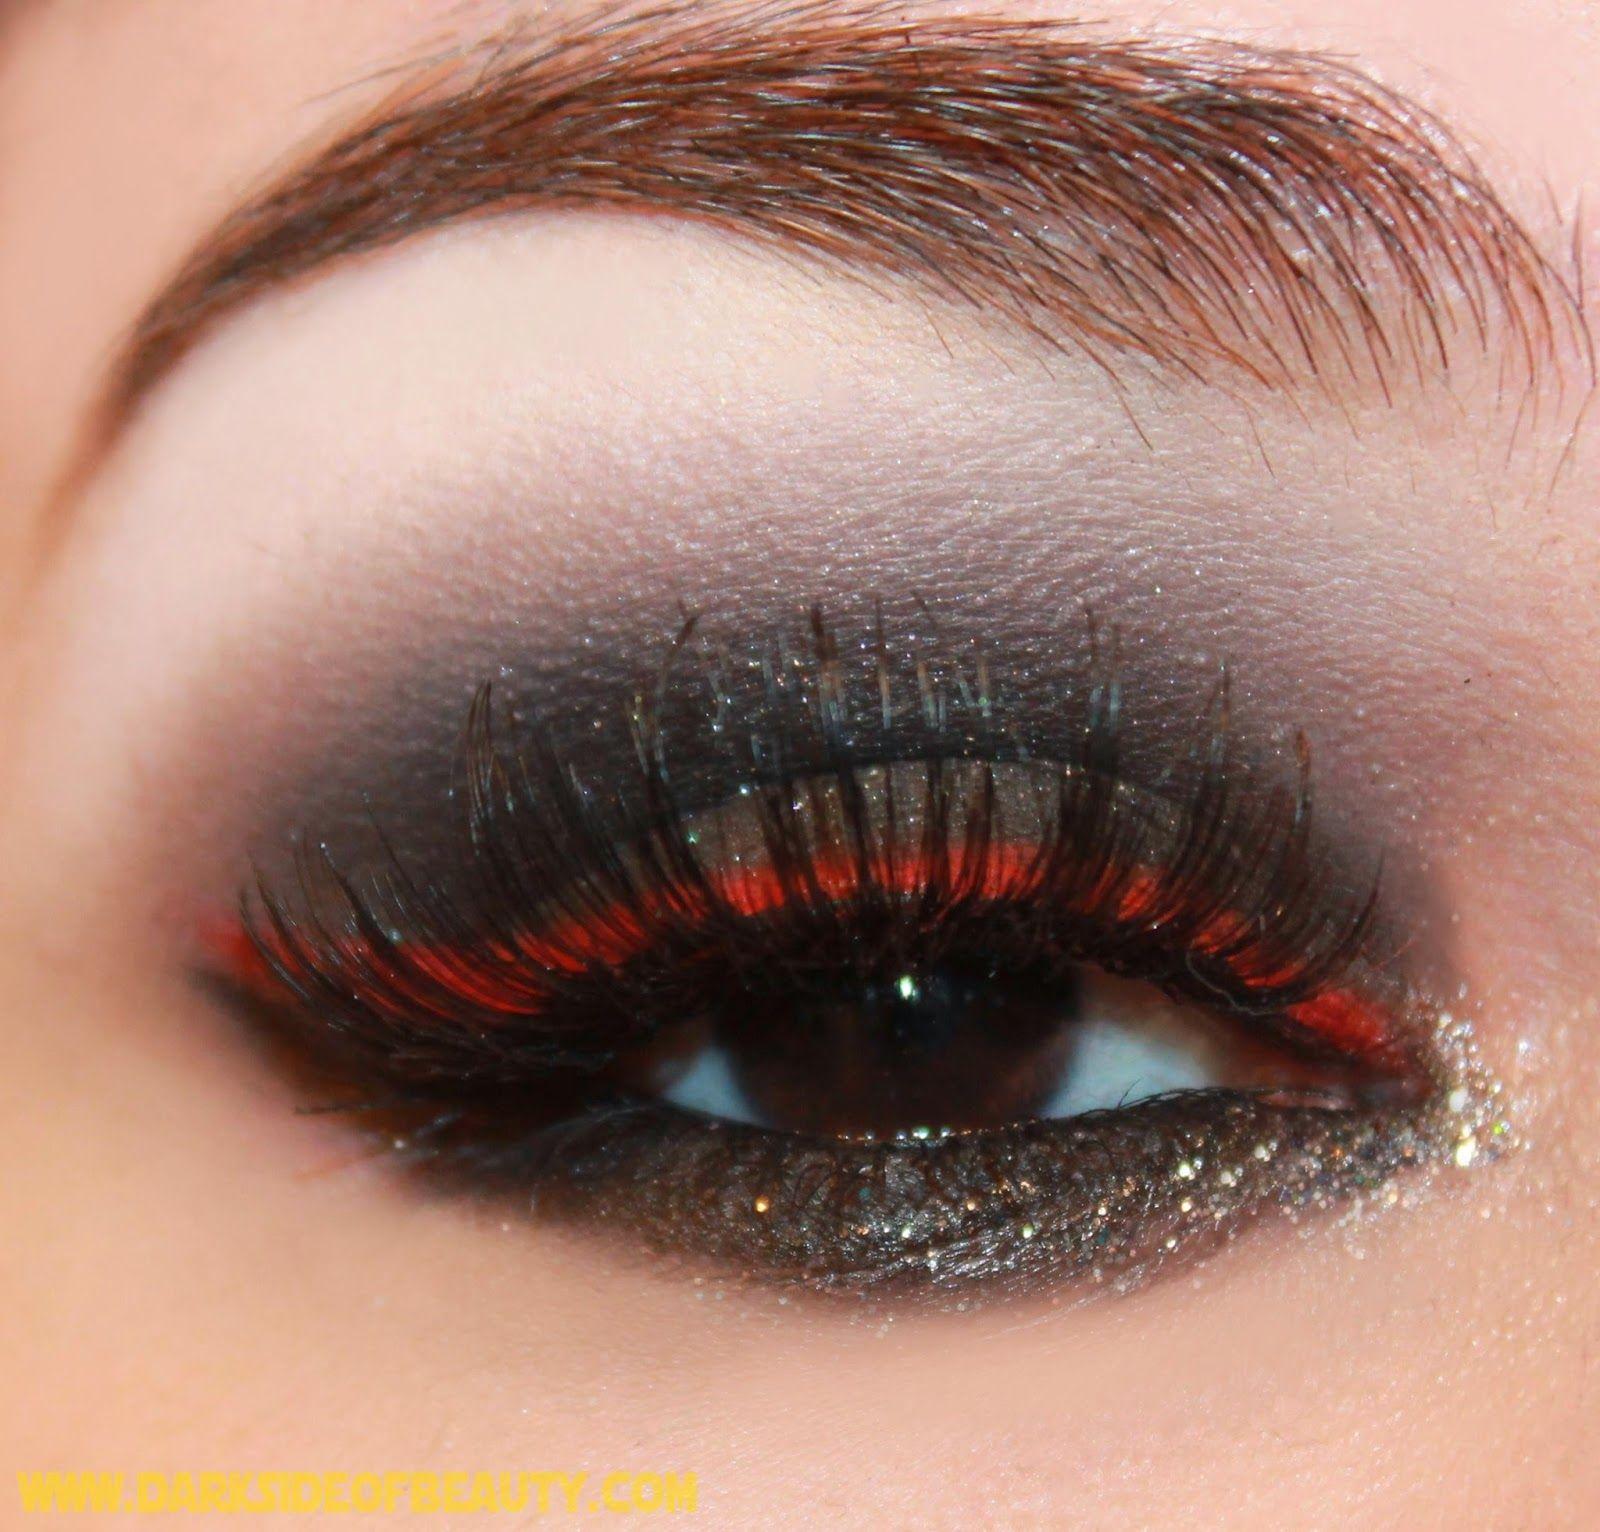 The Dark Side Of Beauty Star Wars Series Darth Vader Star Wars Makeup Disney Makeup Dance Makeup